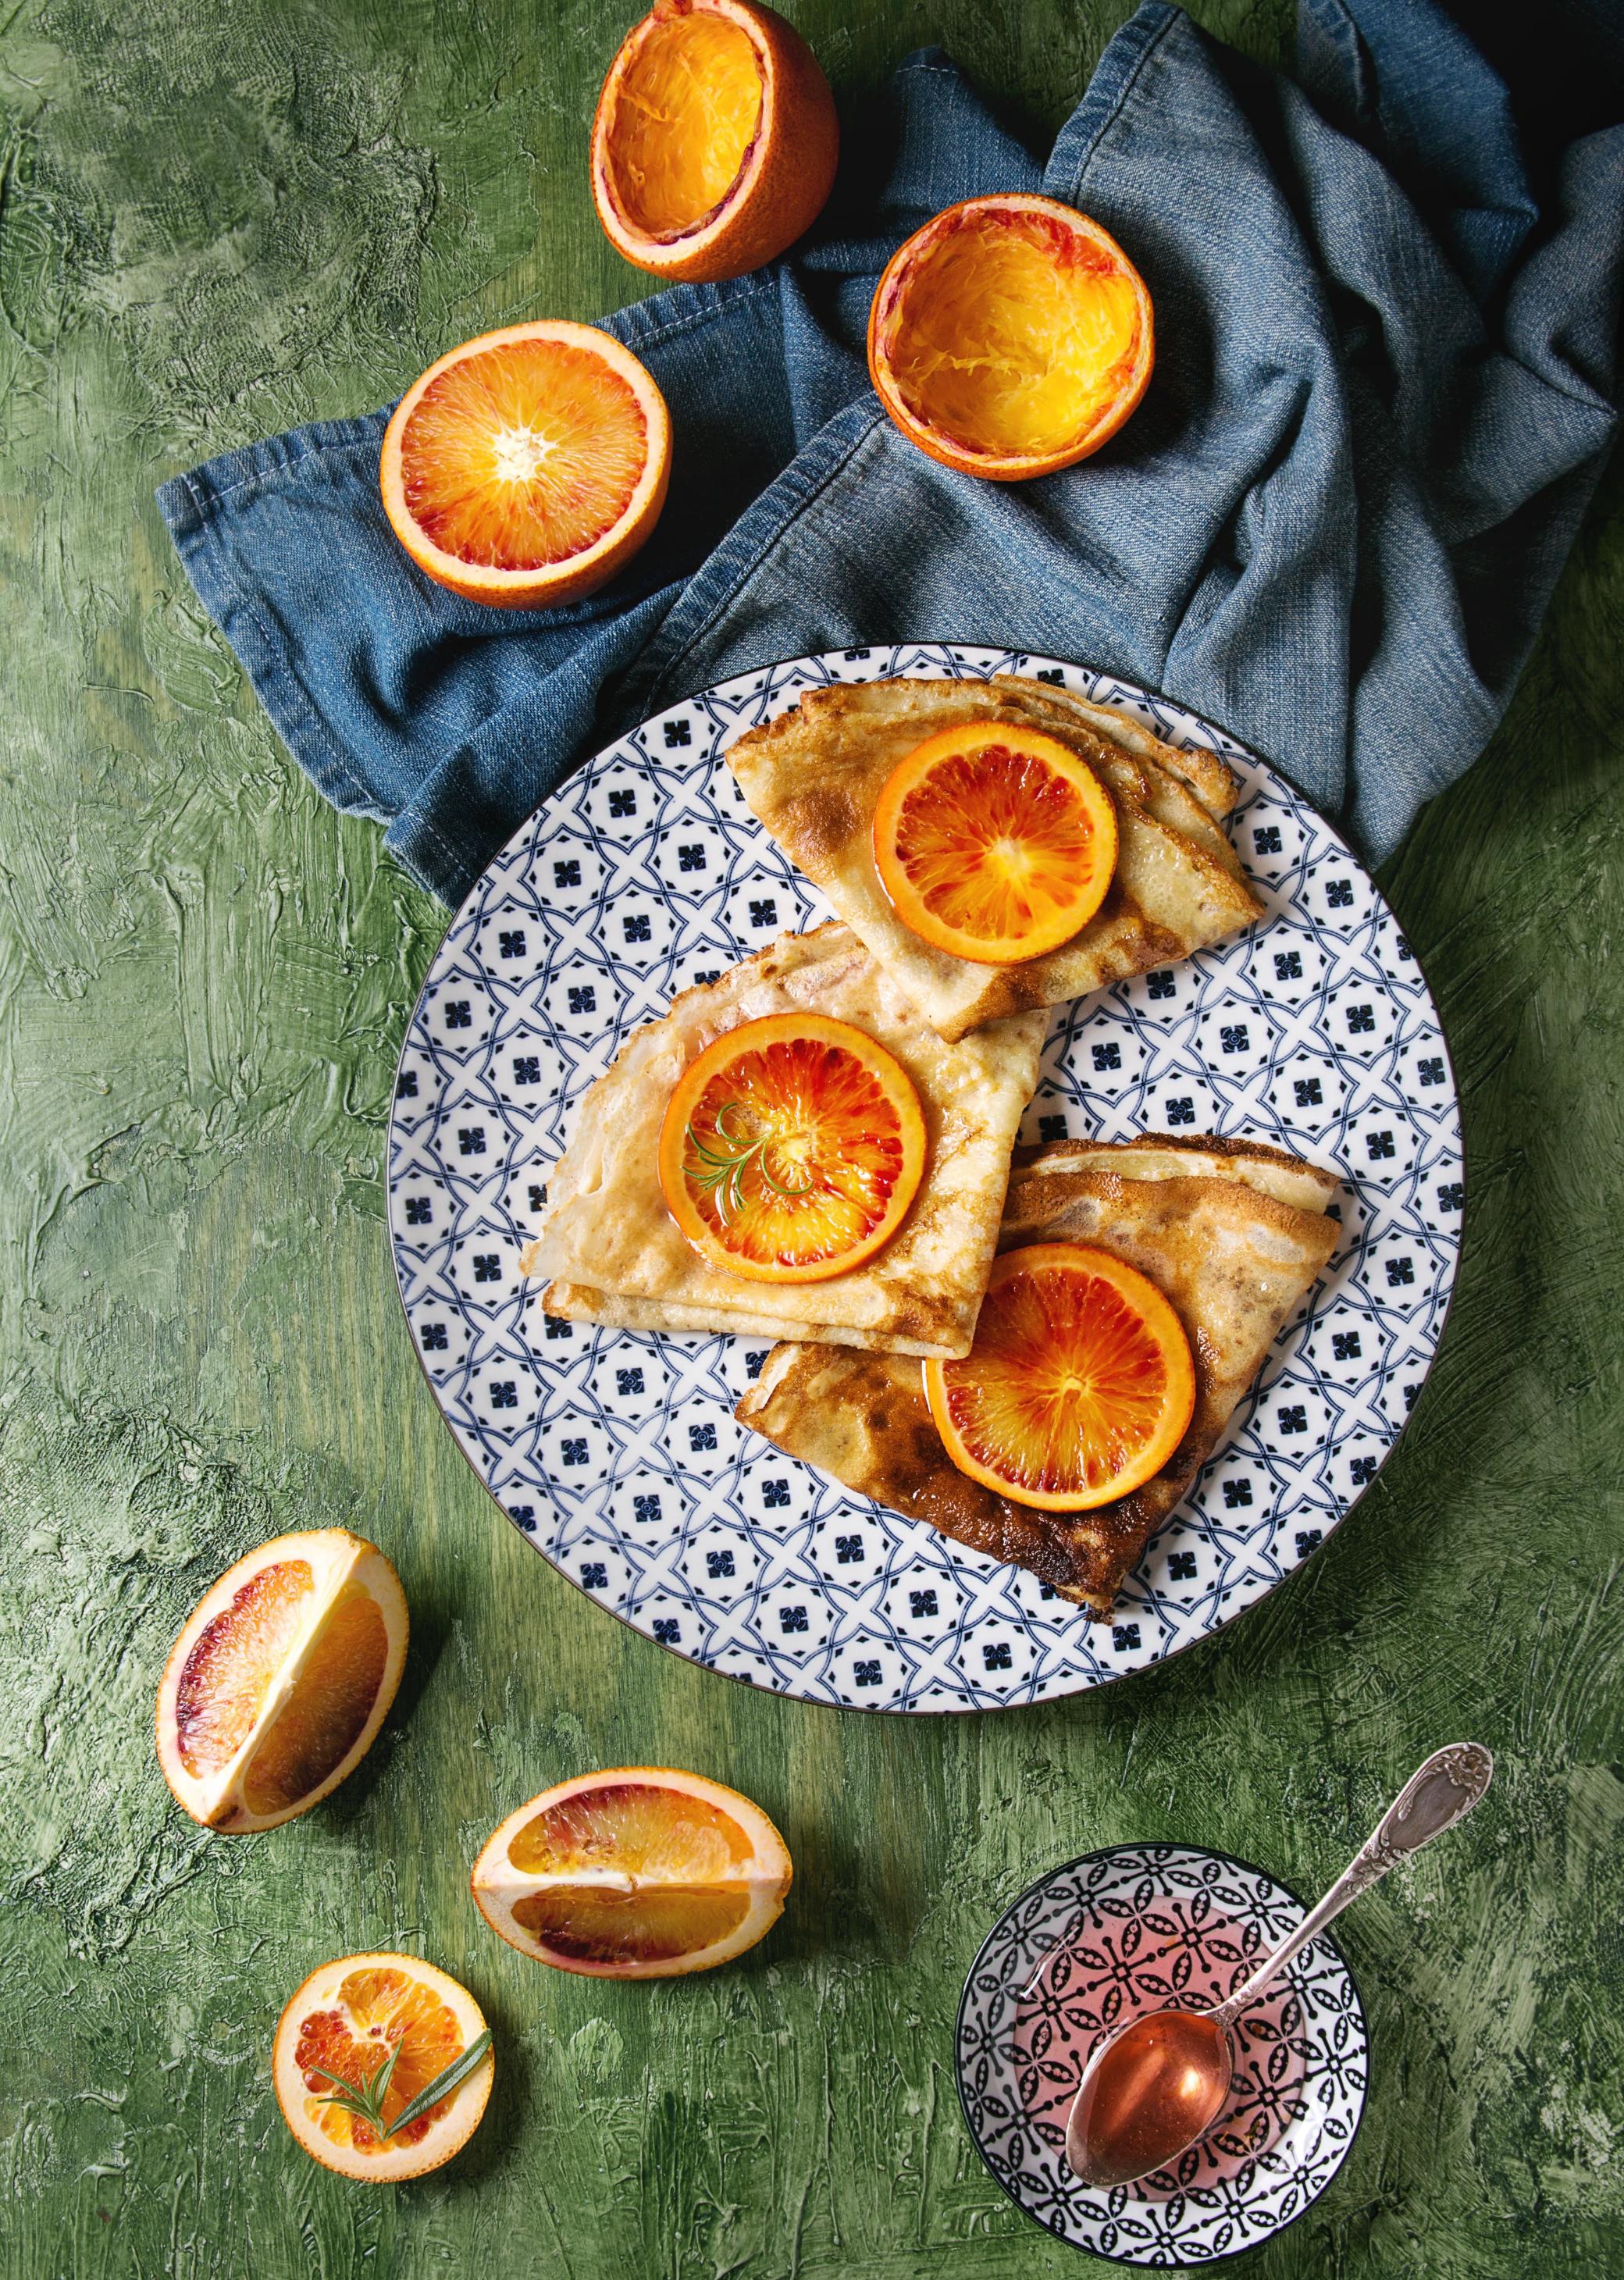 FAQs | Citrus Fruits and Vegetables